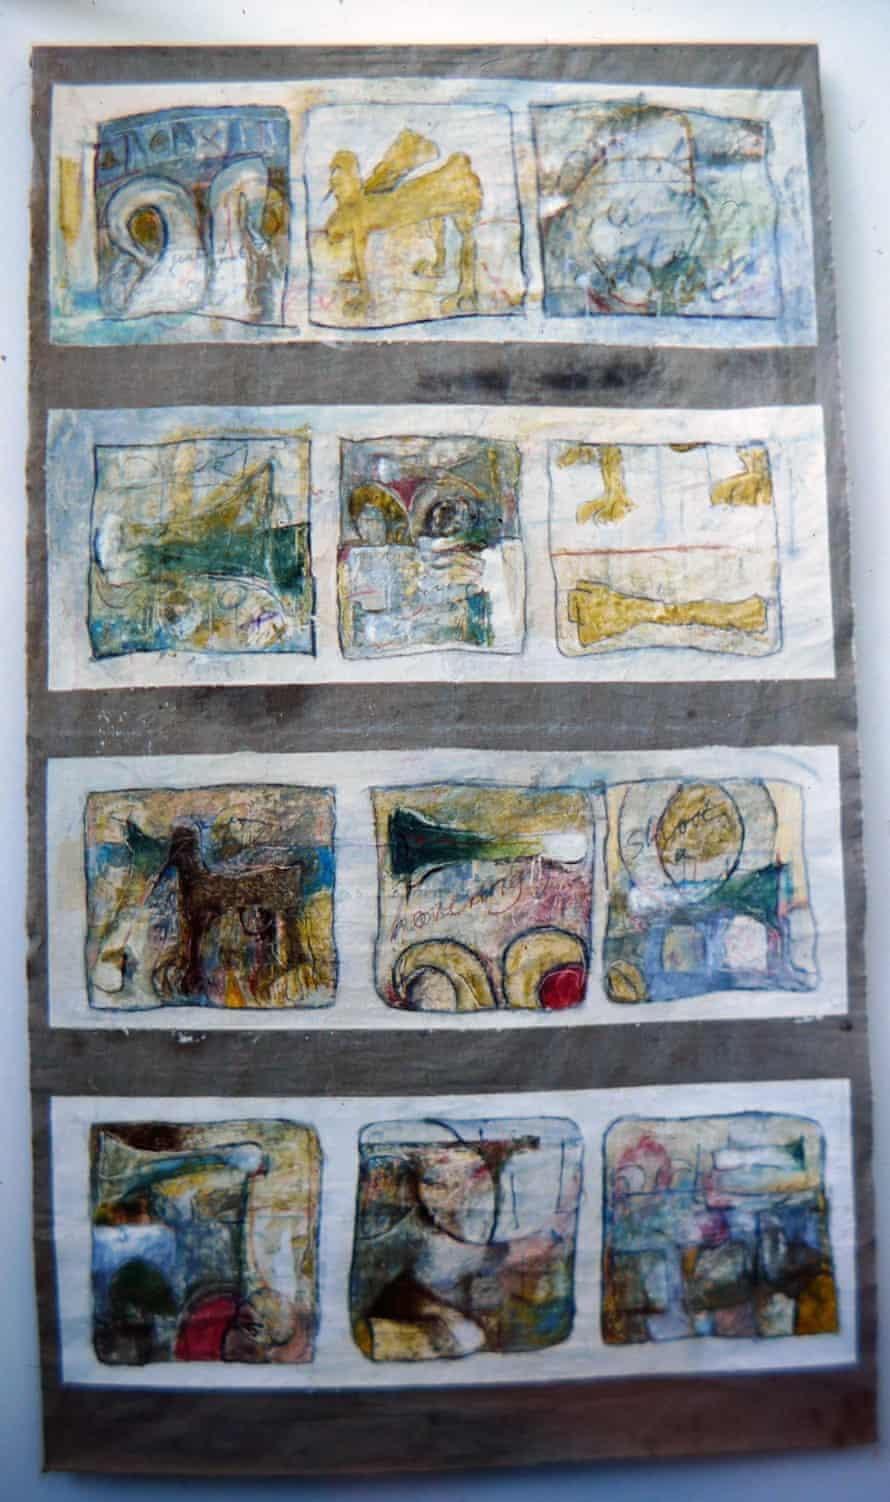 Drawings form Tacita Dean's Falmouth degree show, 1988